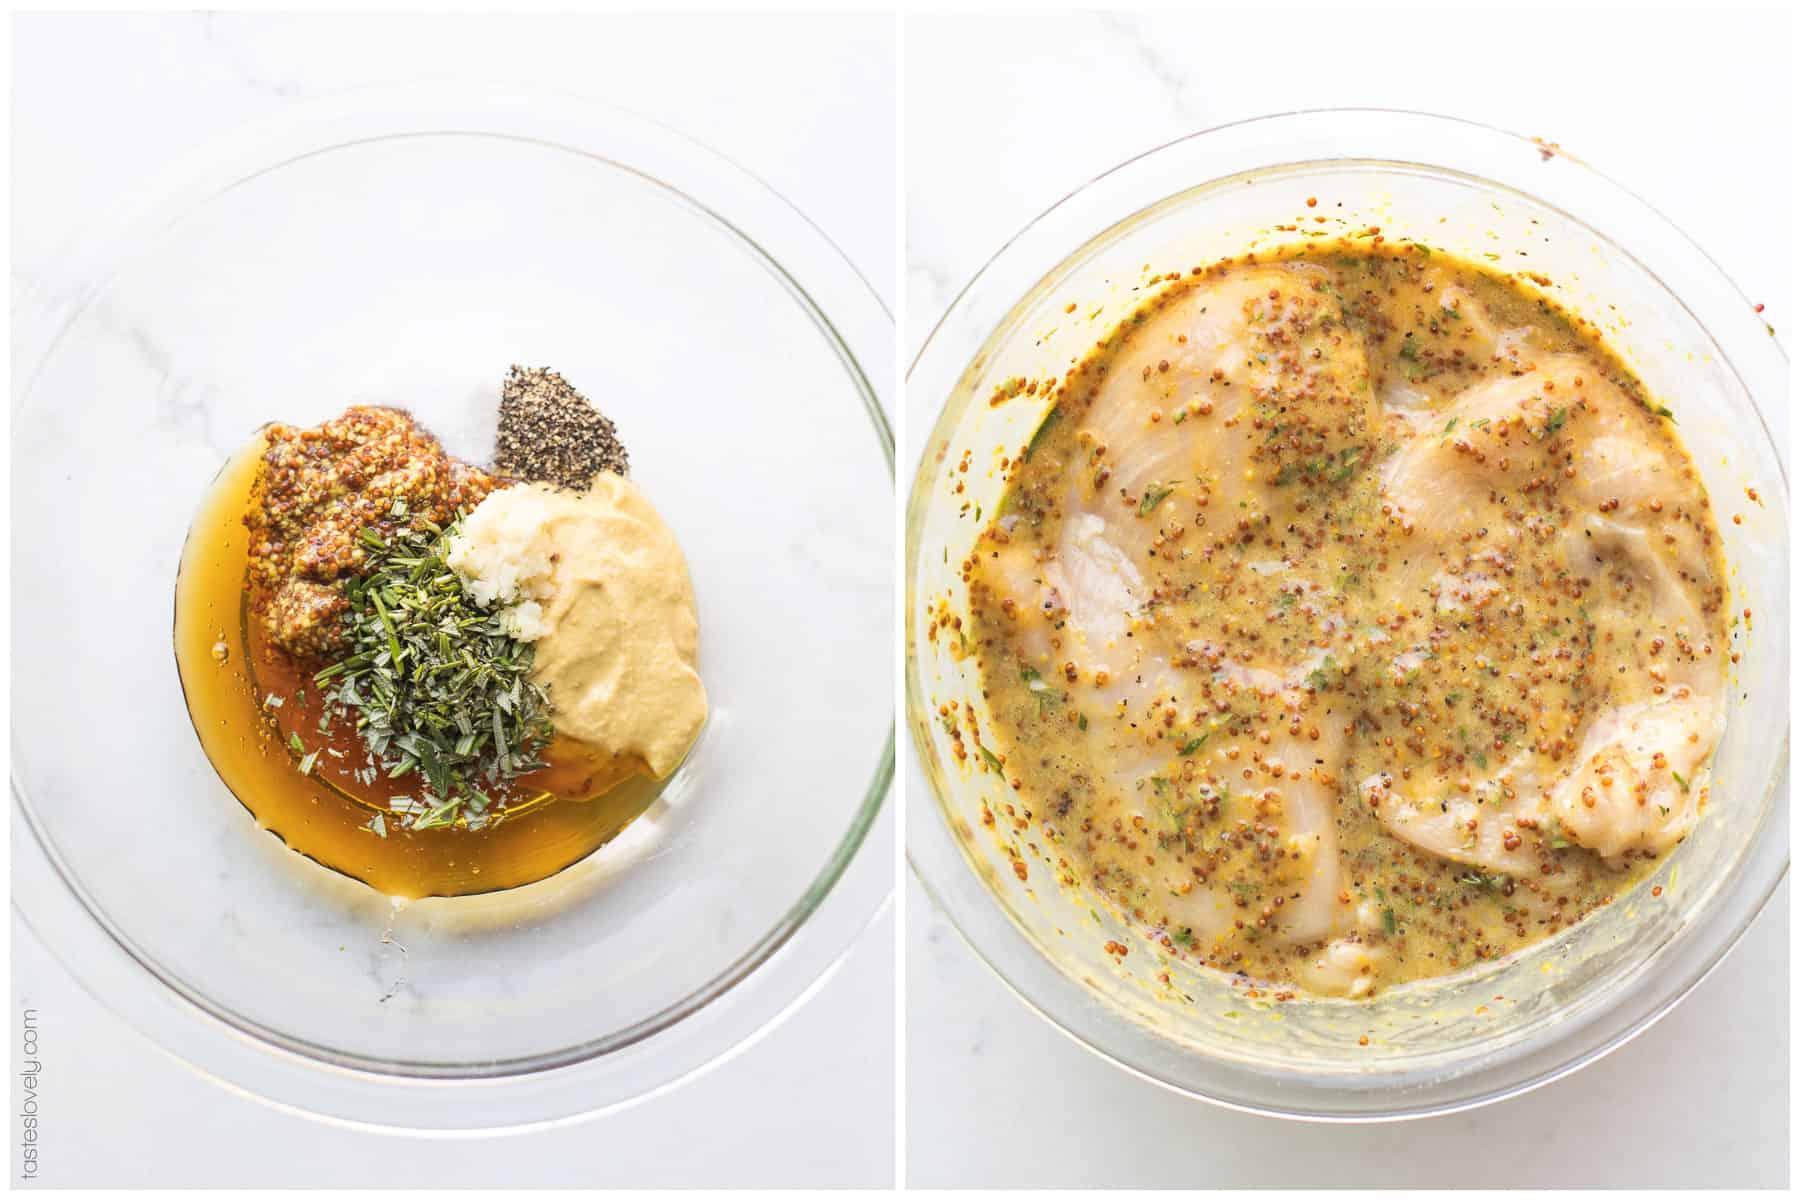 Paleo Rosemary Honey Mustard Chicken Recipe - chicken marinated in a rosemary honey mustard sauce and baked in the oven. Ready in 30 minutes! #paleo #glutenfree #grainfree #dairyfree #sugarfree #refinedsugarfree #cleaneating #realfood